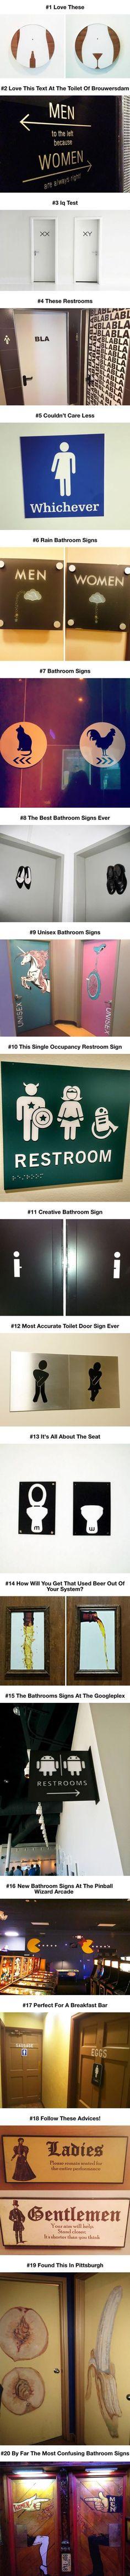 Most Creative Bathroom Signs